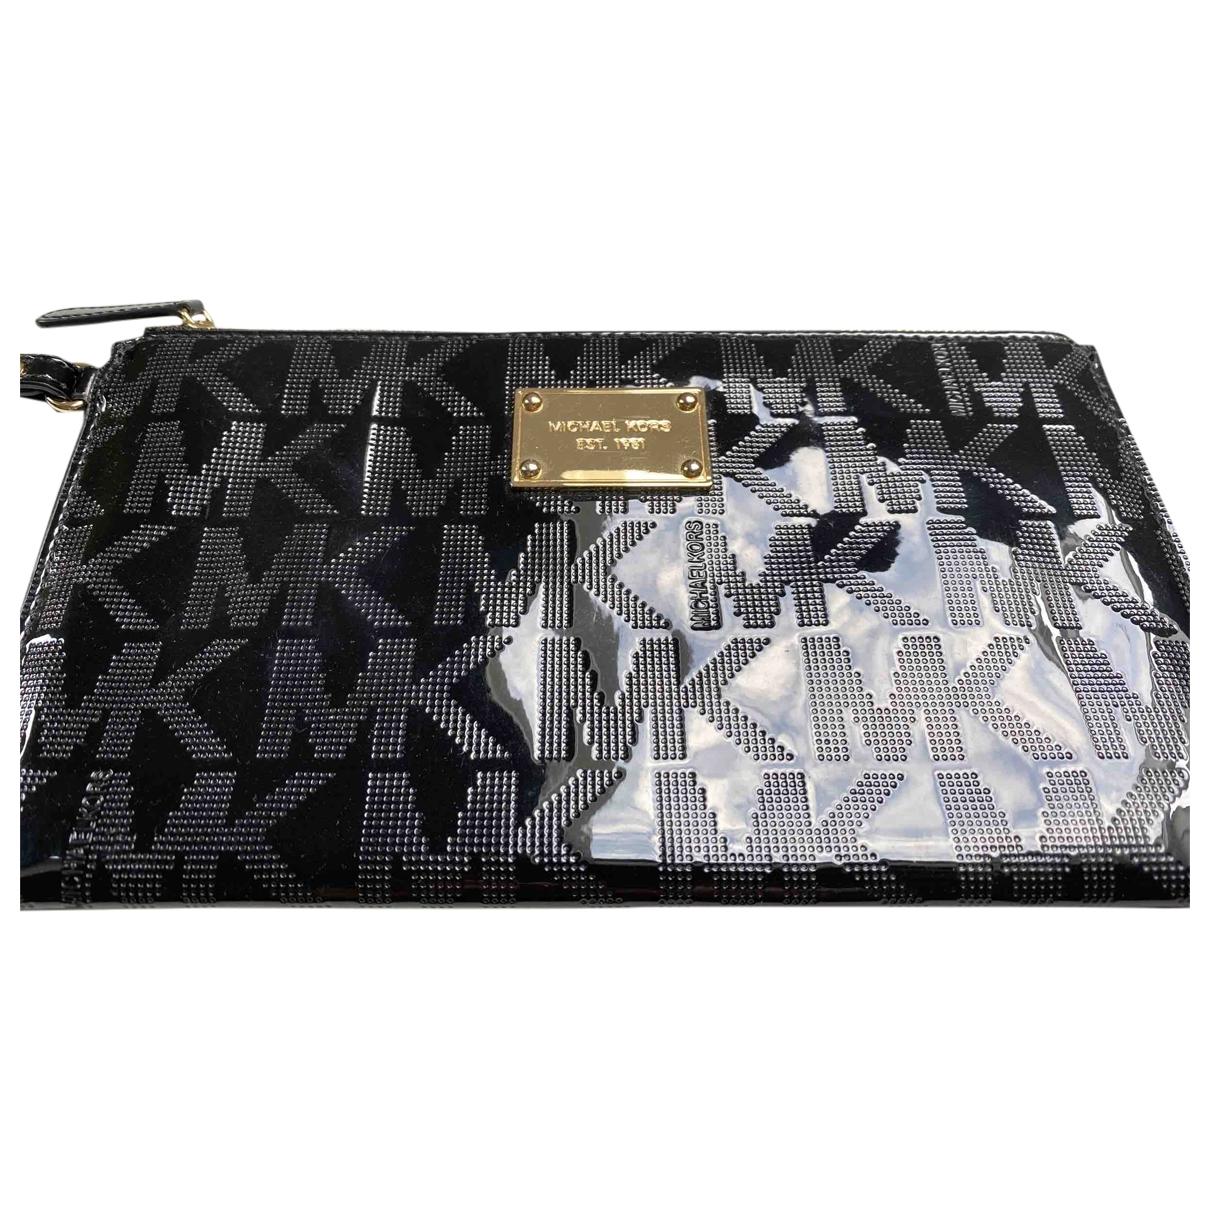 Michael Kors \N Black Patent leather Clutch bag for Women \N